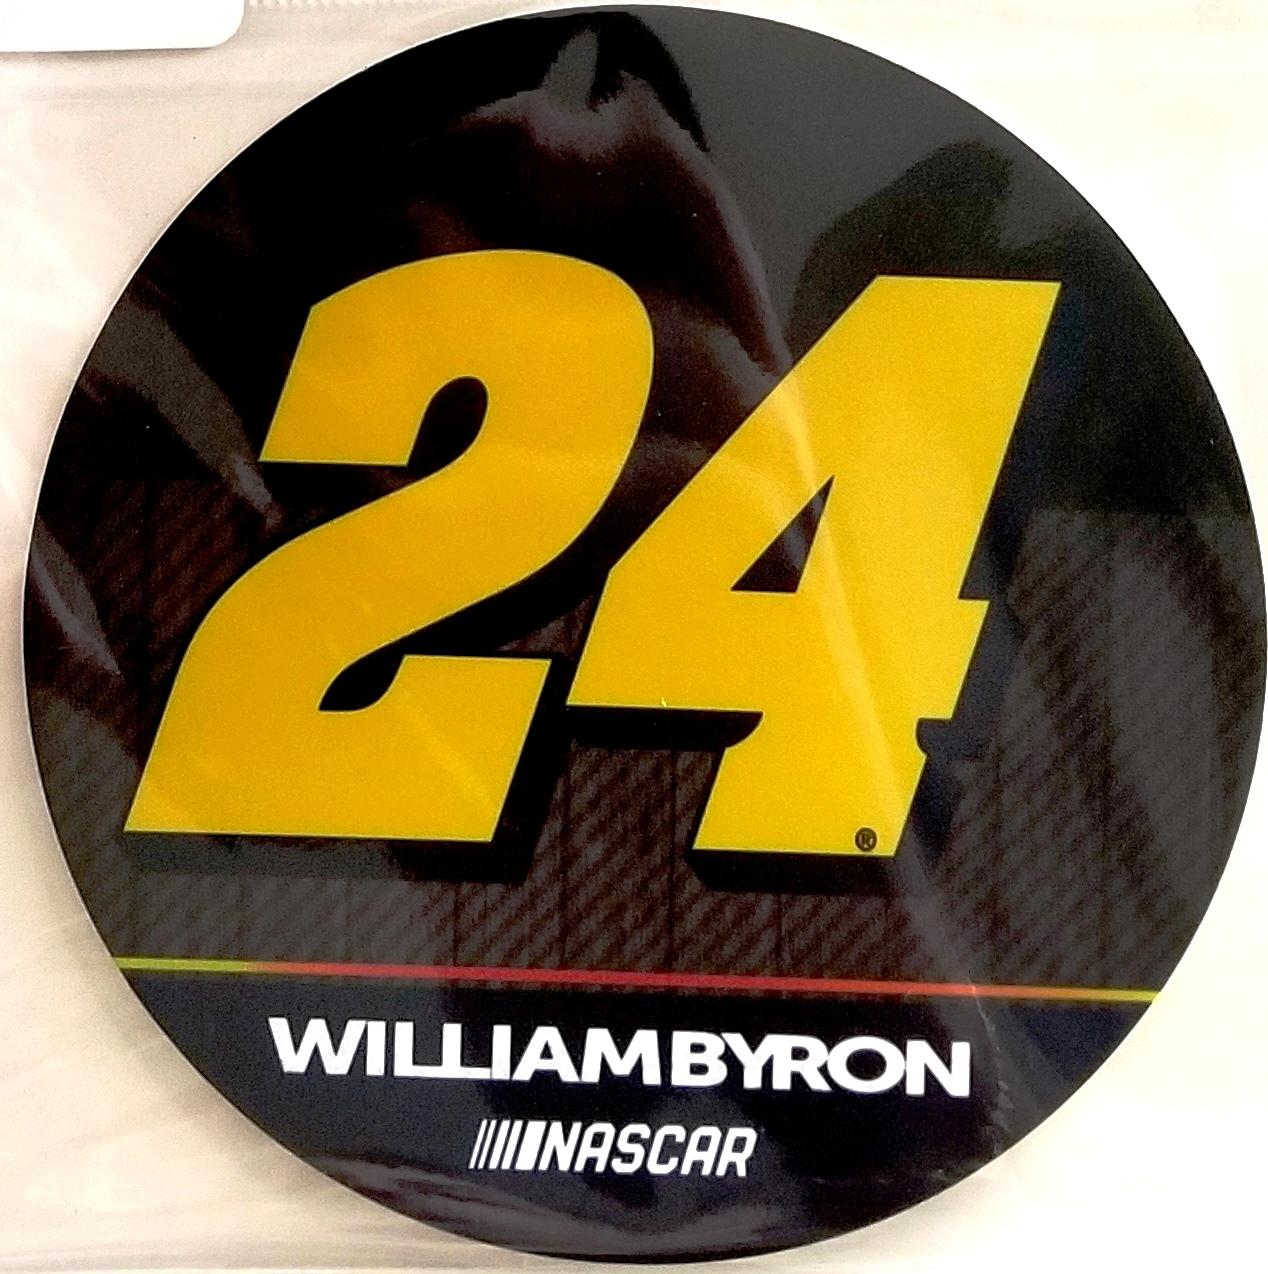 William byron 24 decal rr 4 round vinyl auto home heavy duty nascar racing